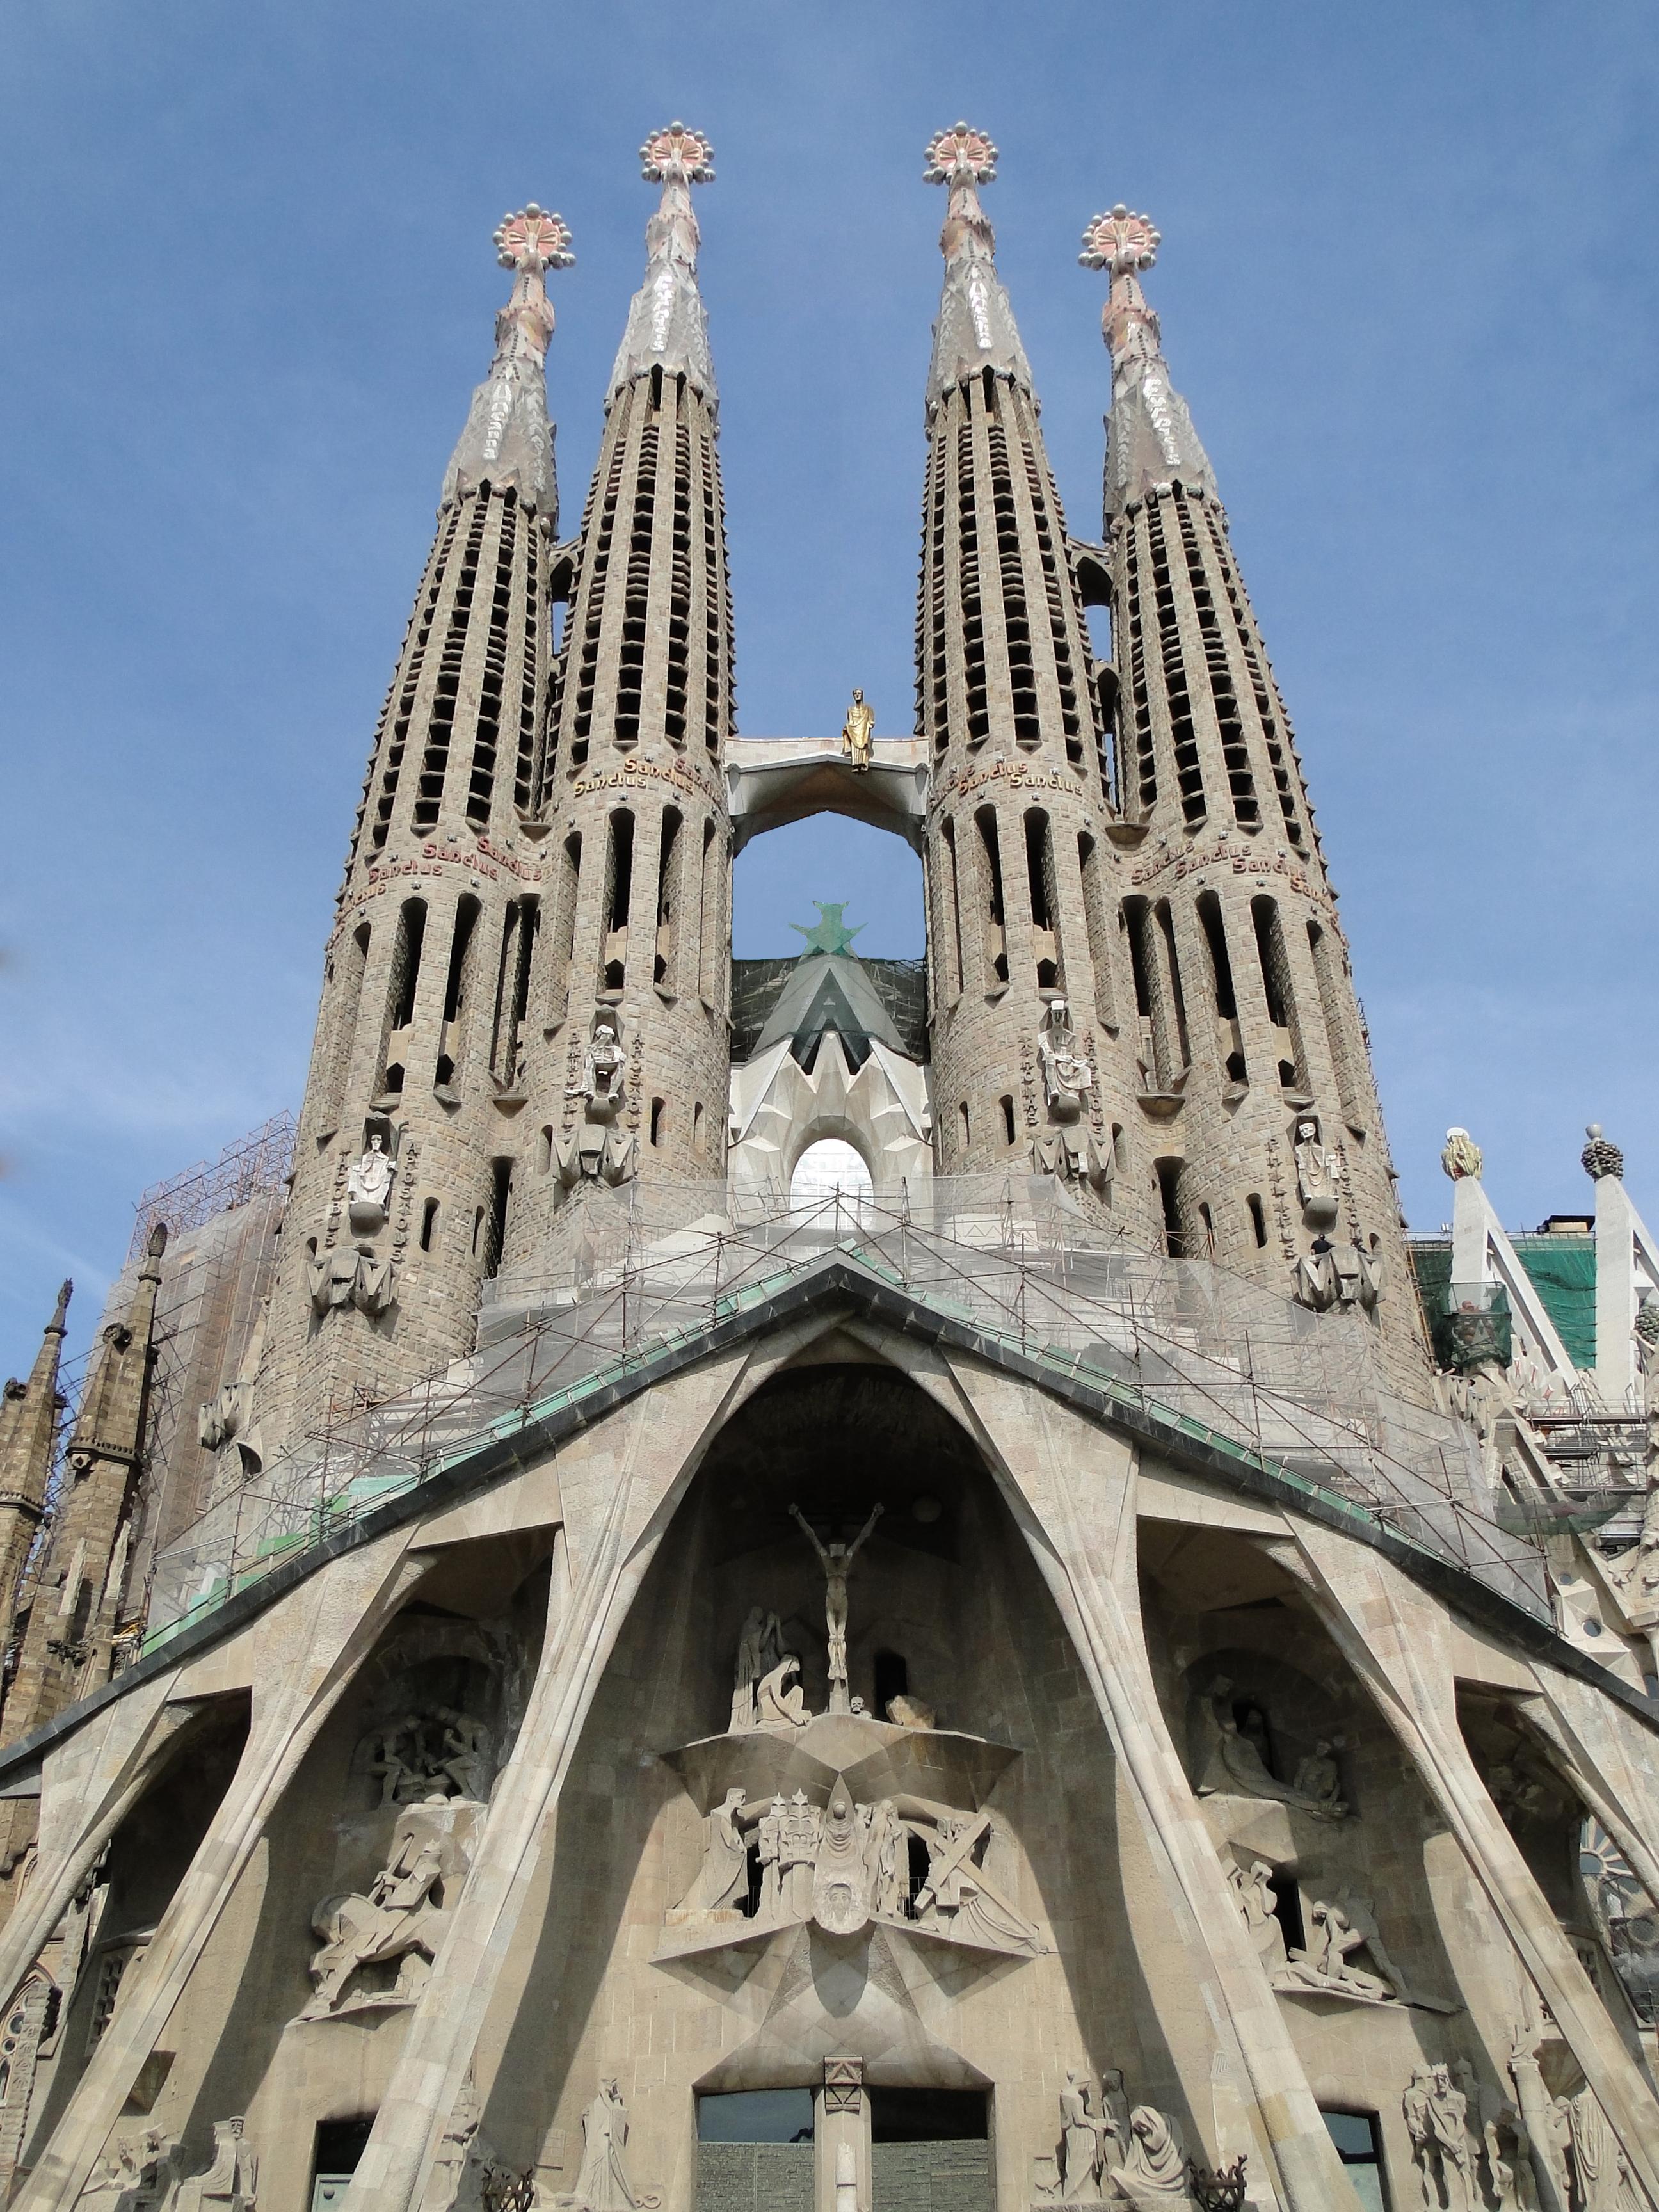 Sagrada Familia: File:Sagrada Familia 03.jpg